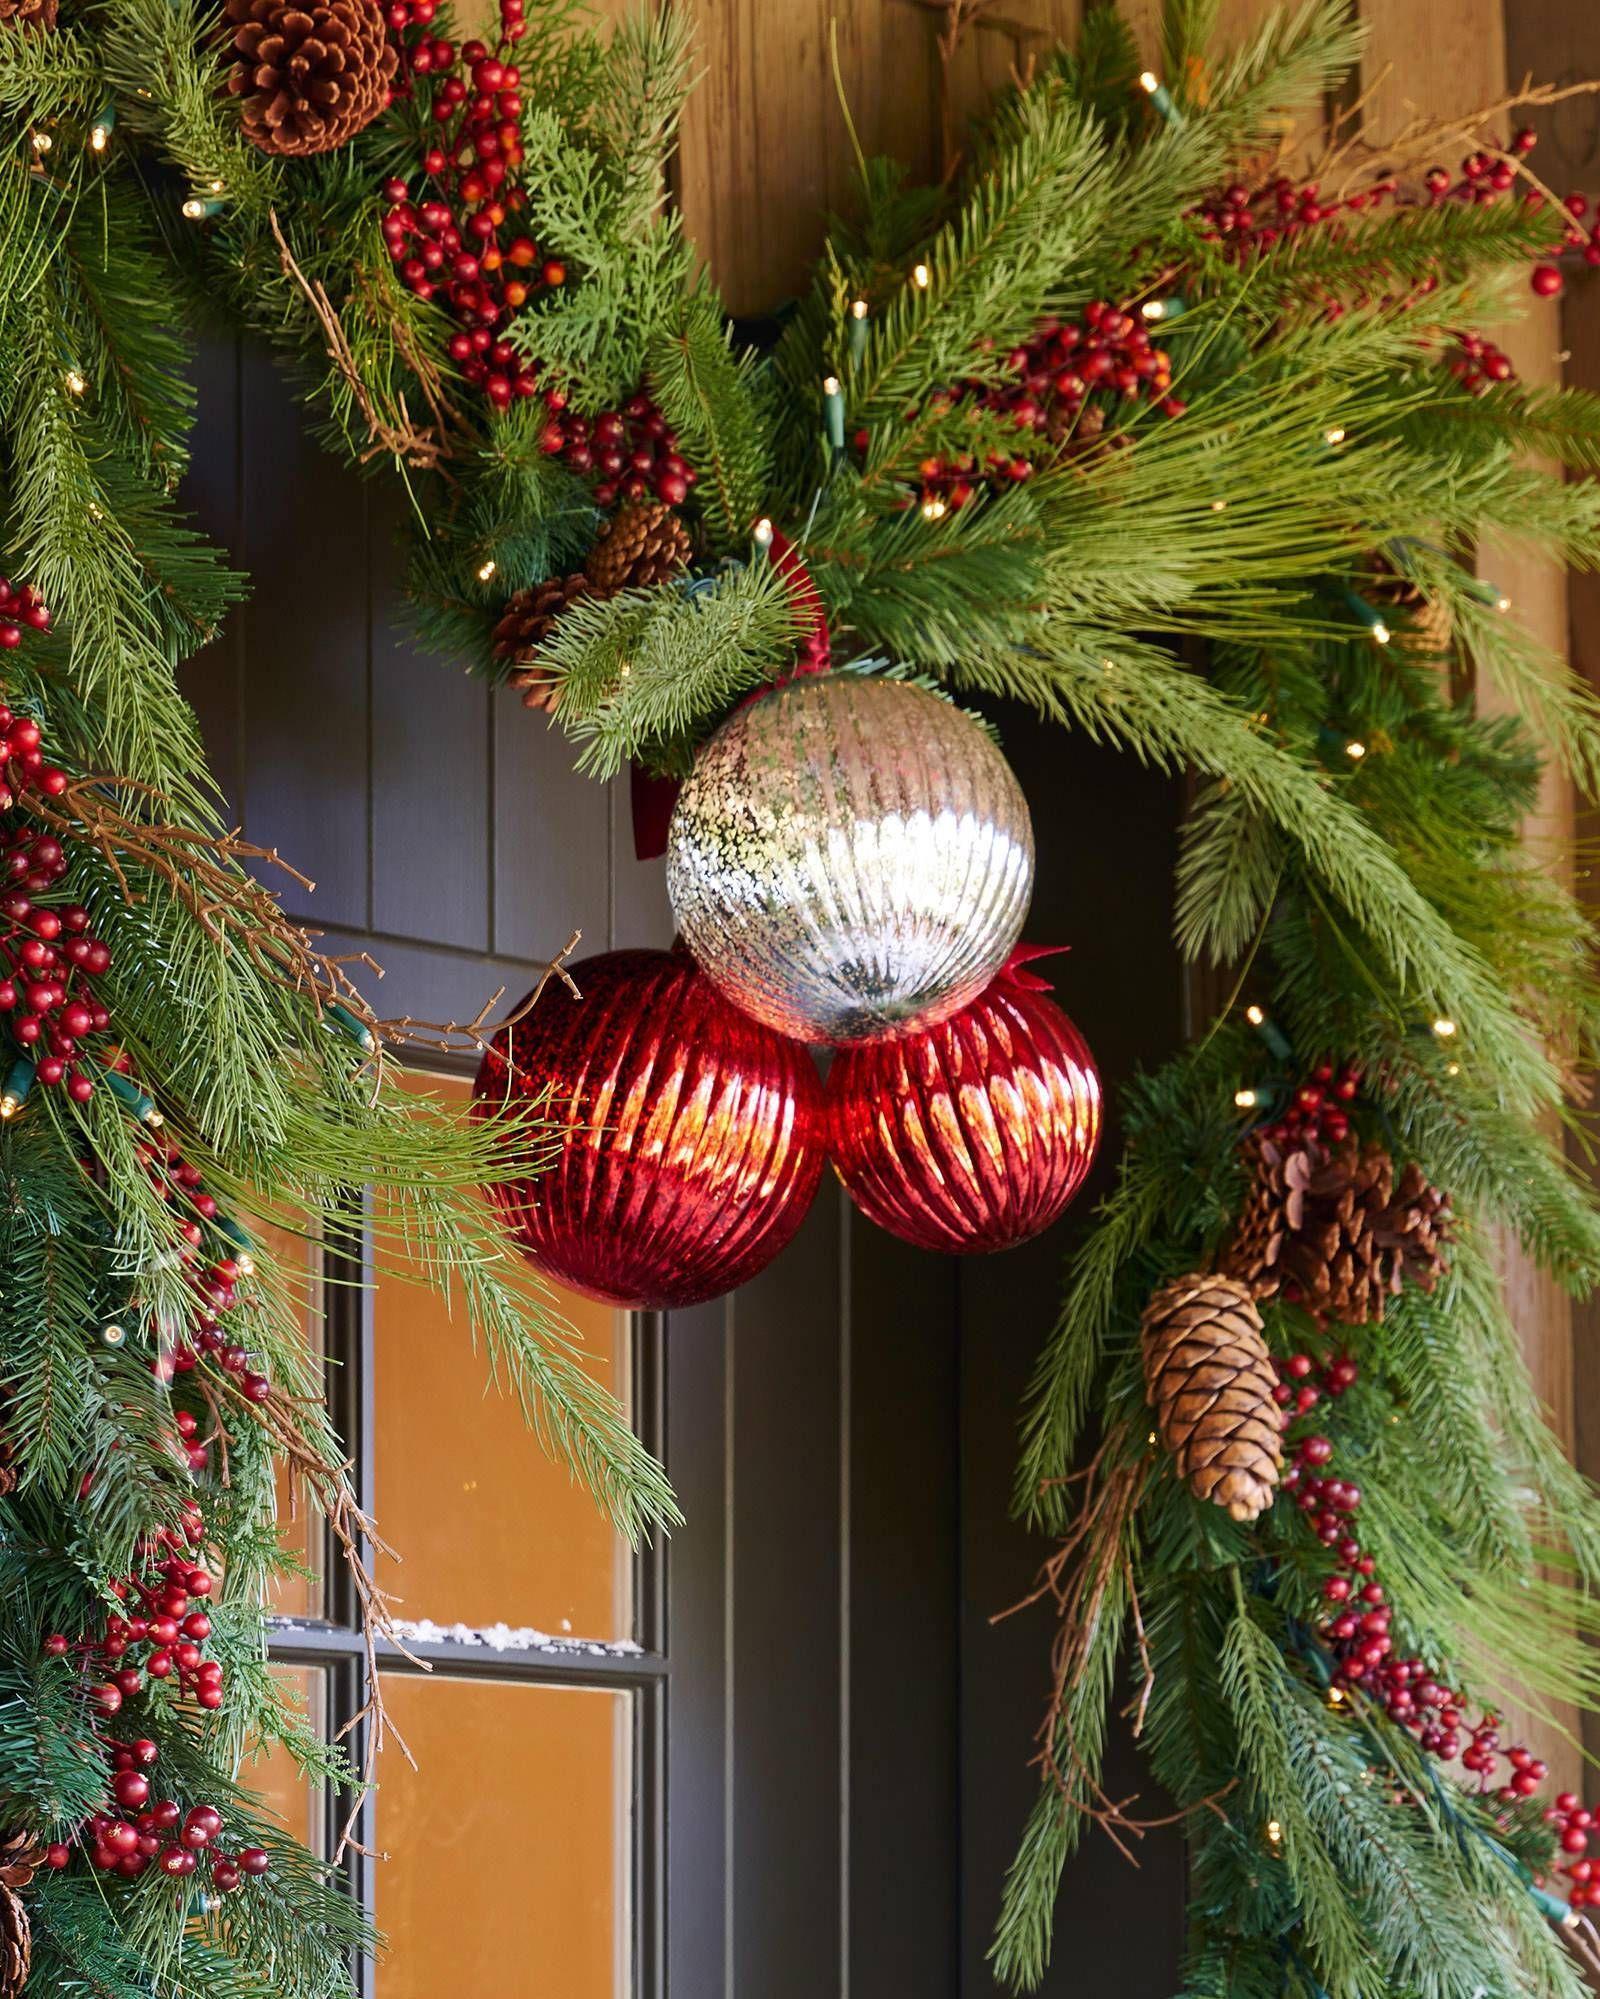 Outdoor Draping Pine Foliage Balsam Hill Artificial Christmas Wreaths Christmas Wreaths Garlands Christmas Wreaths